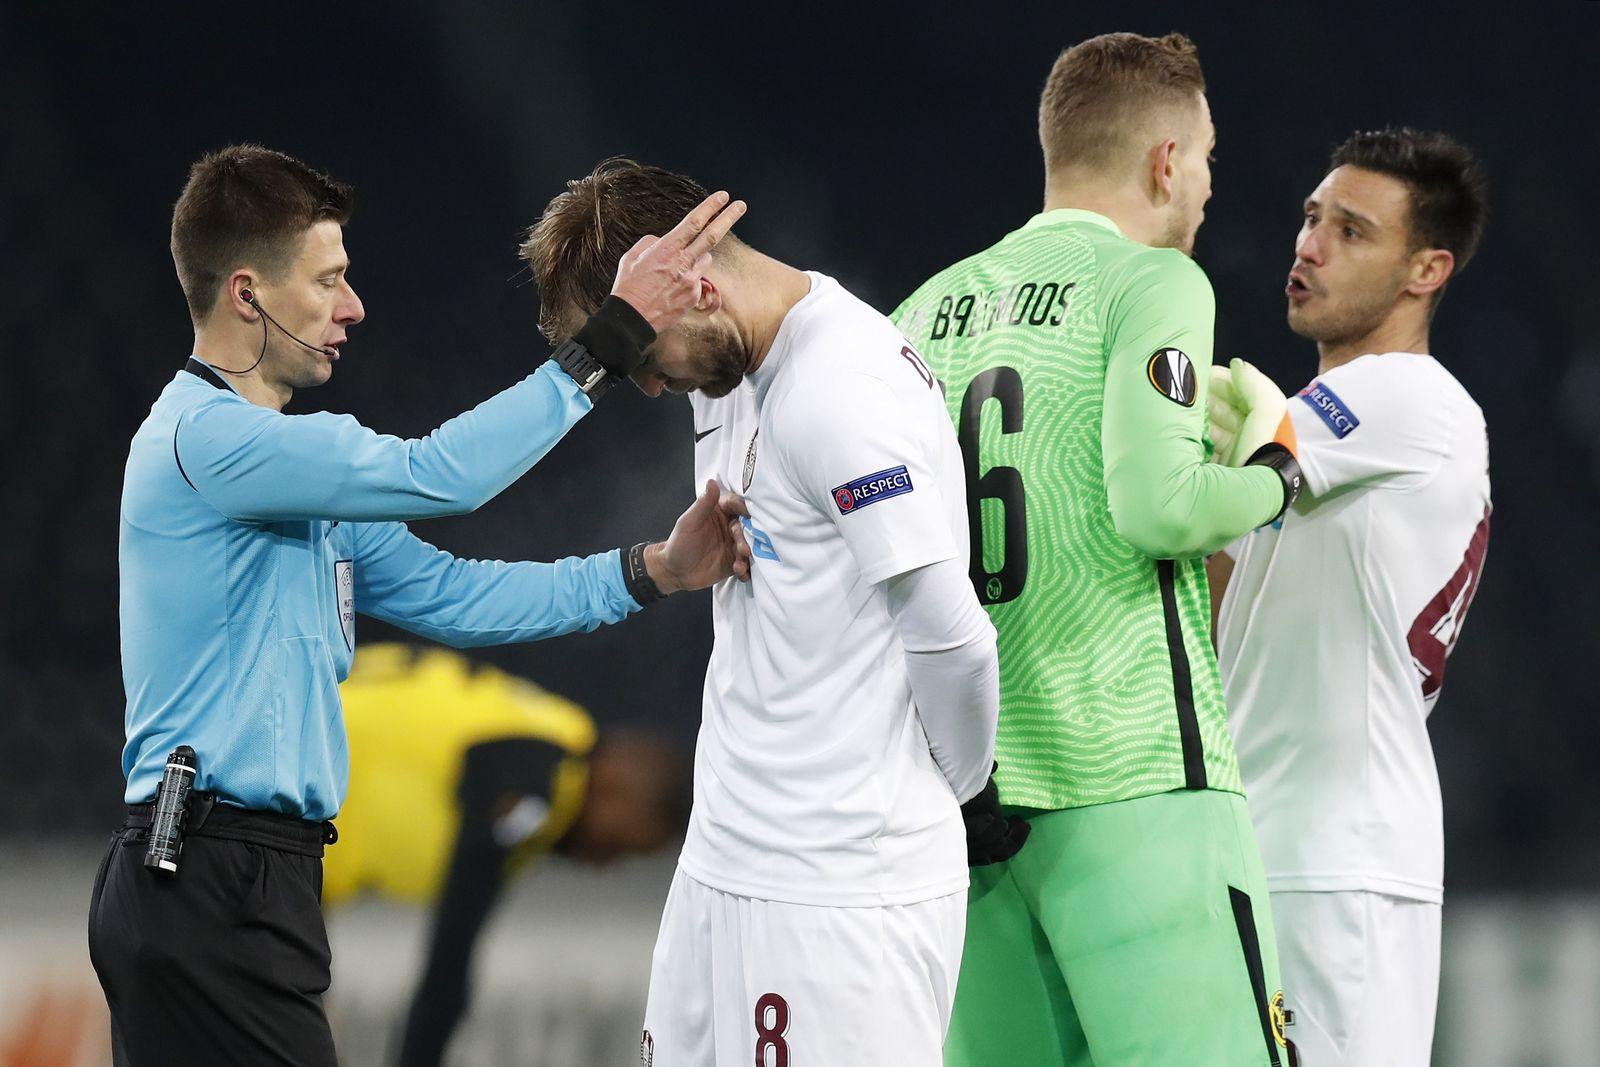 Young Boys Bern vs CFR Cluj, Switzerland - 10 Dec 2020